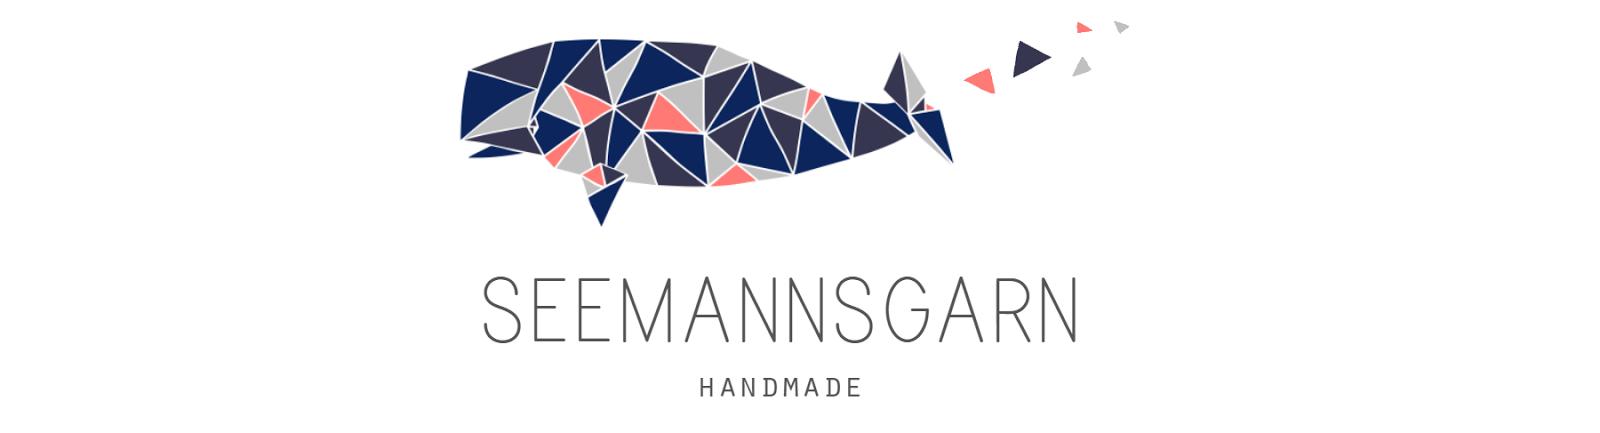 Seemannsgarn • handmade